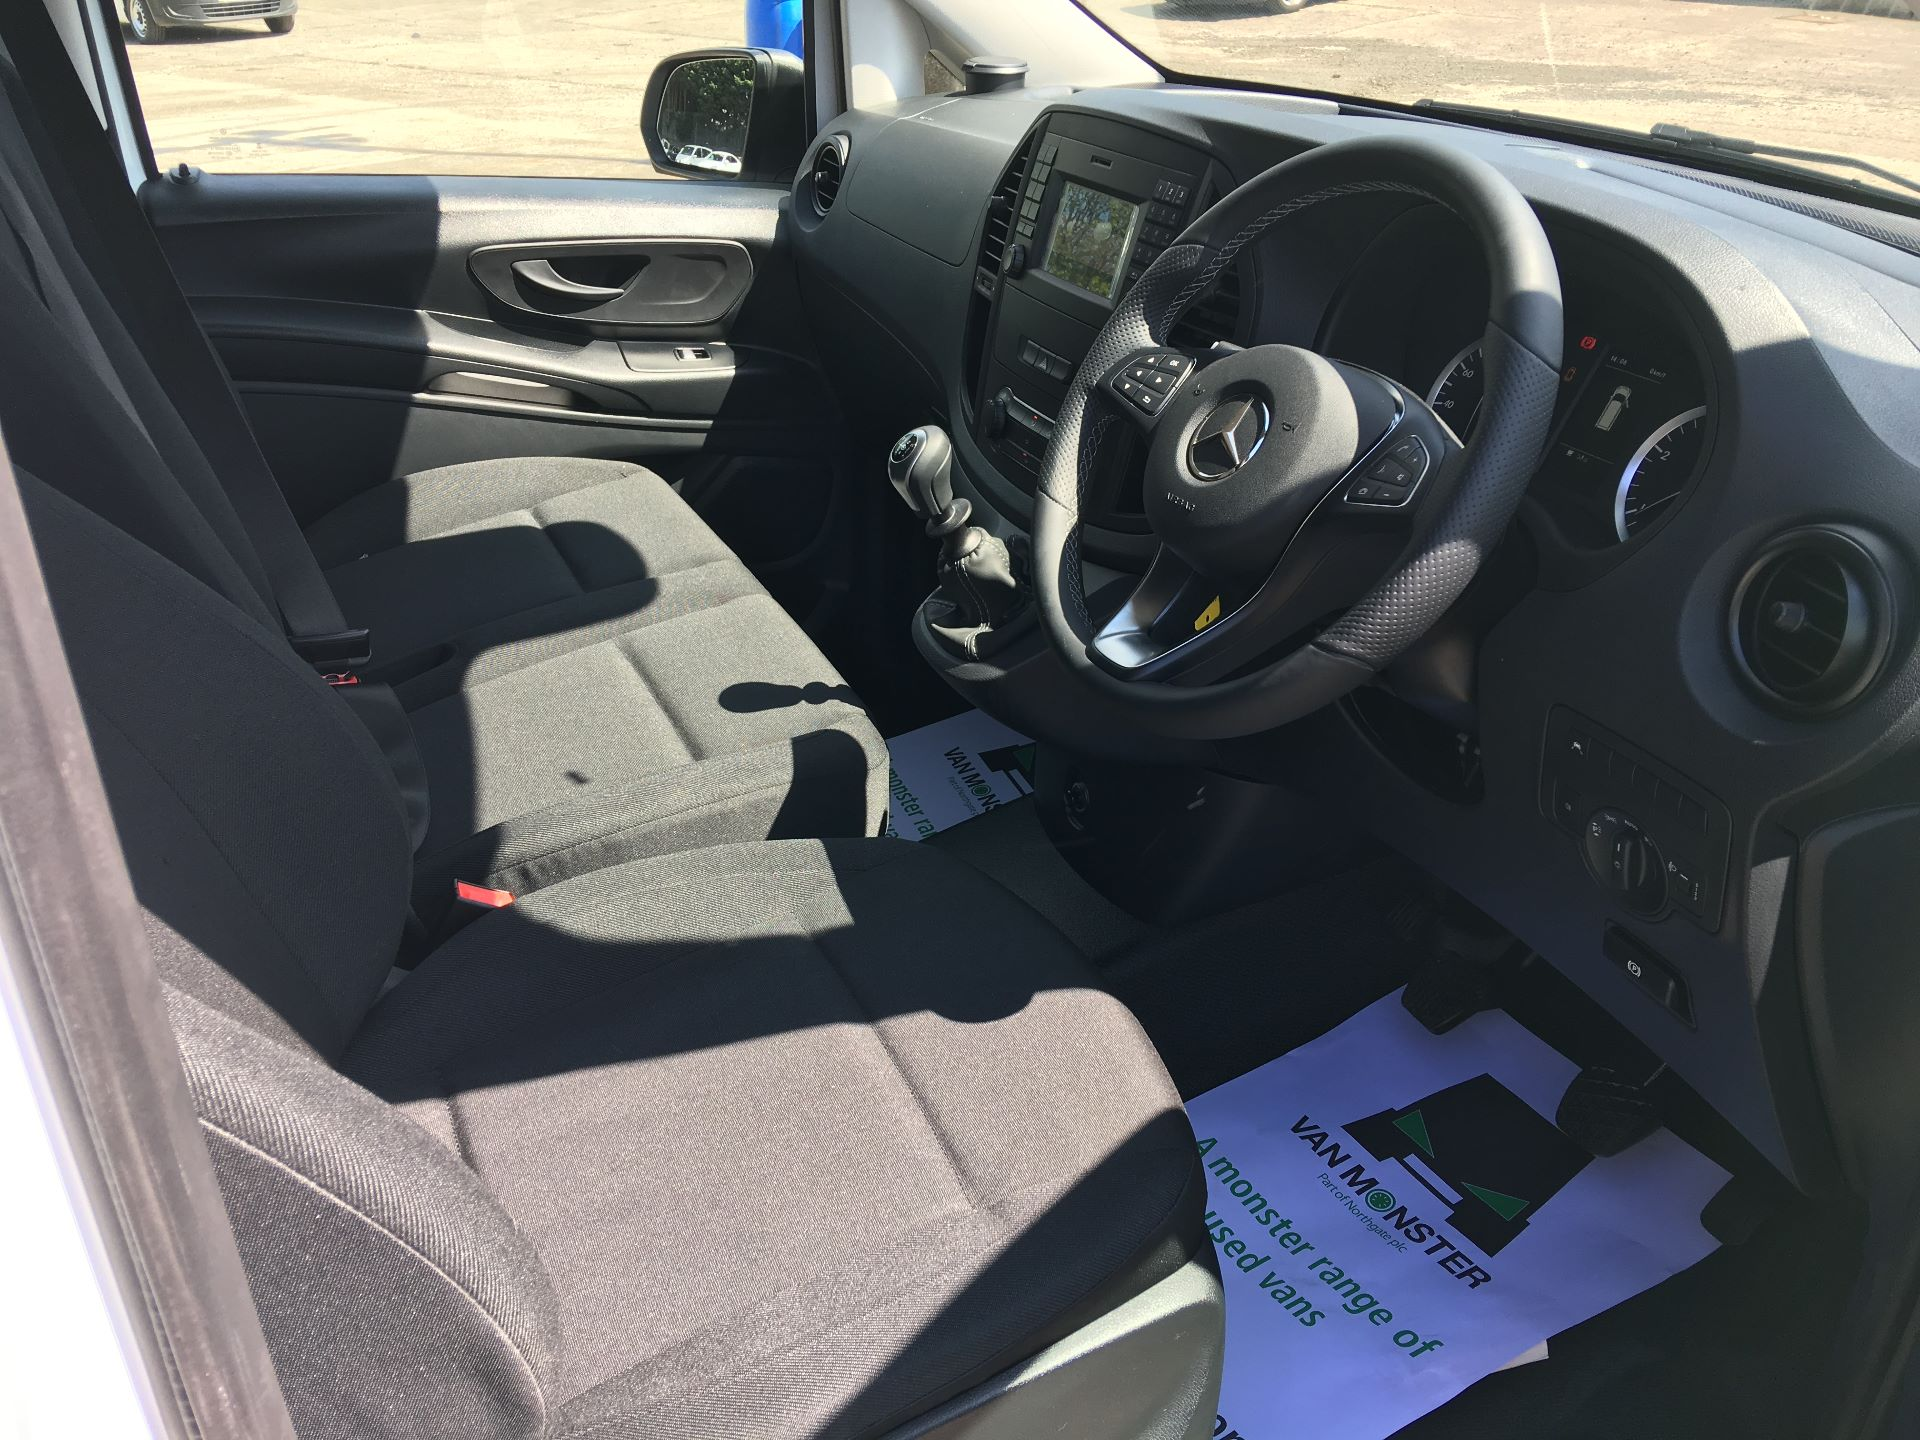 2019 Mercedes-Benz Vito LONG 111 CDI VAN EURO 5/6 (YM19HFY) Image 2